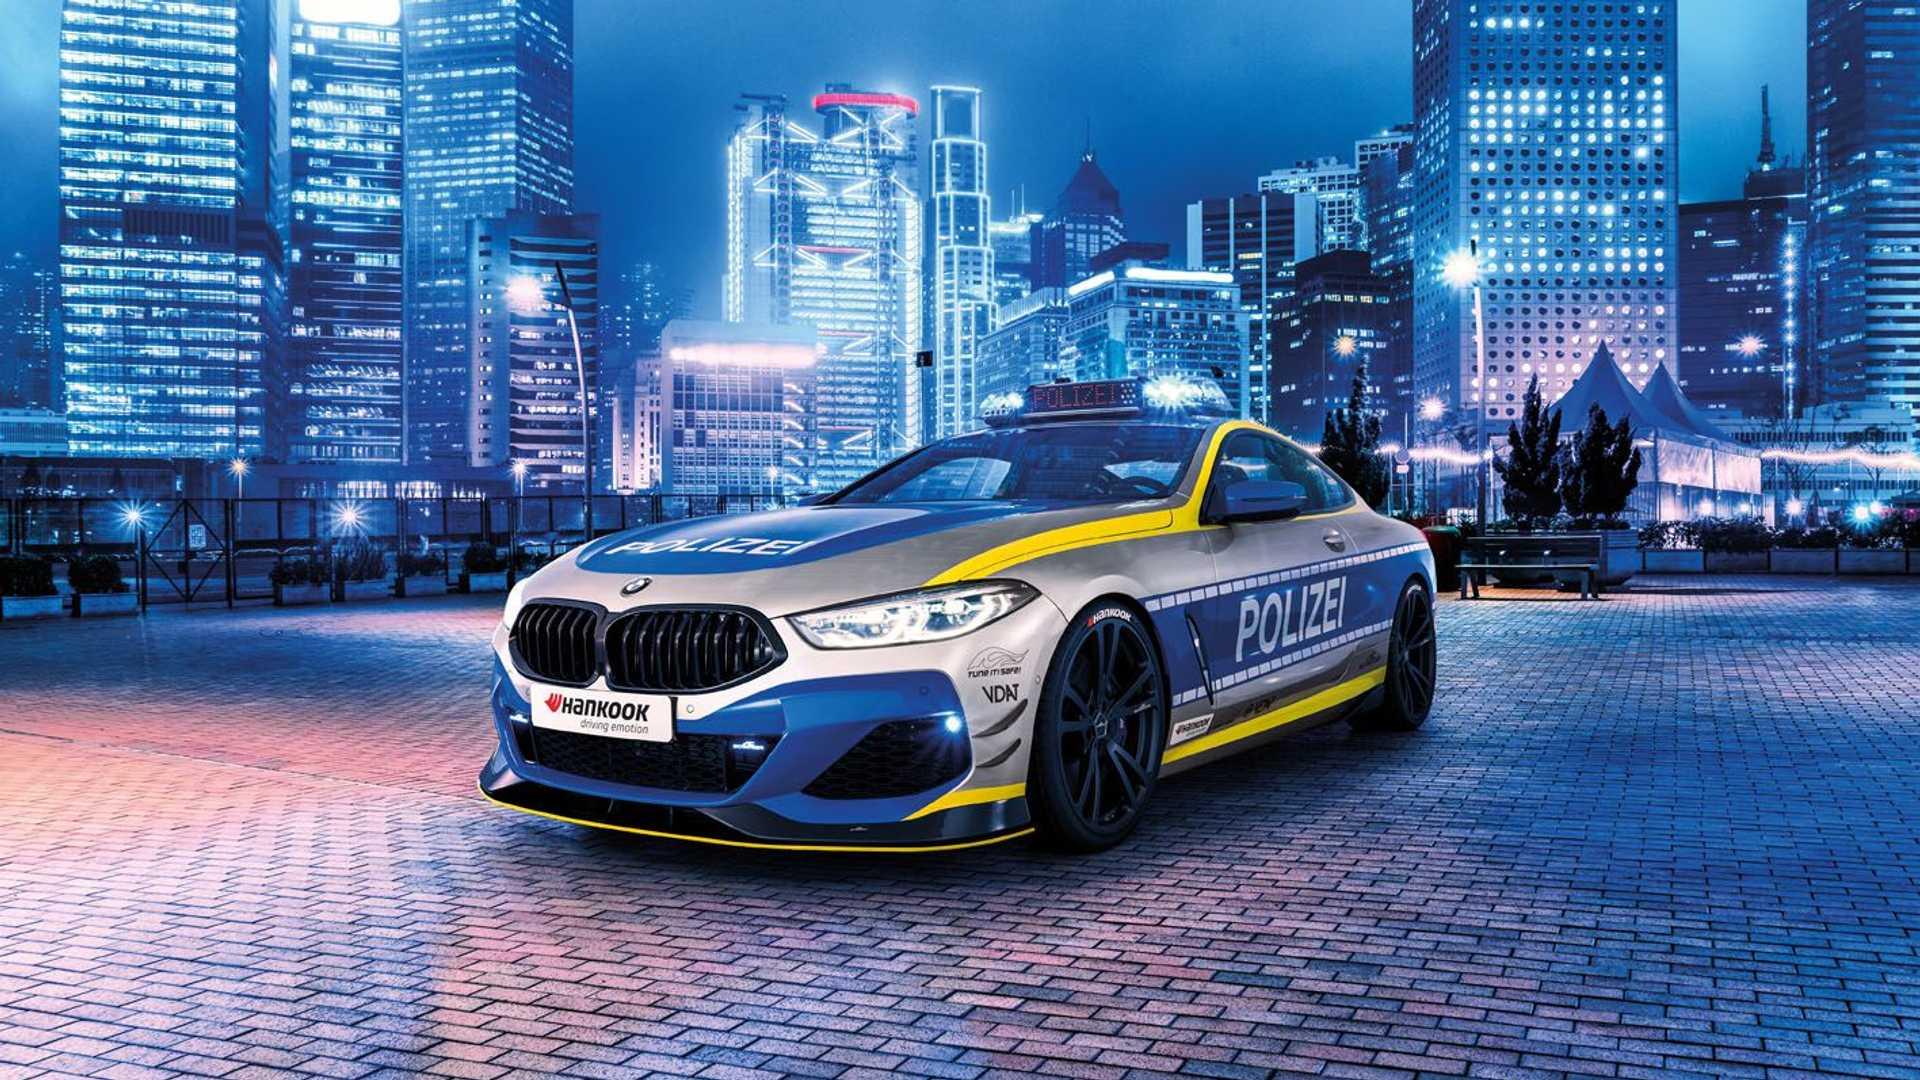 BMW-M850i-police-car-tune-it-safe-4